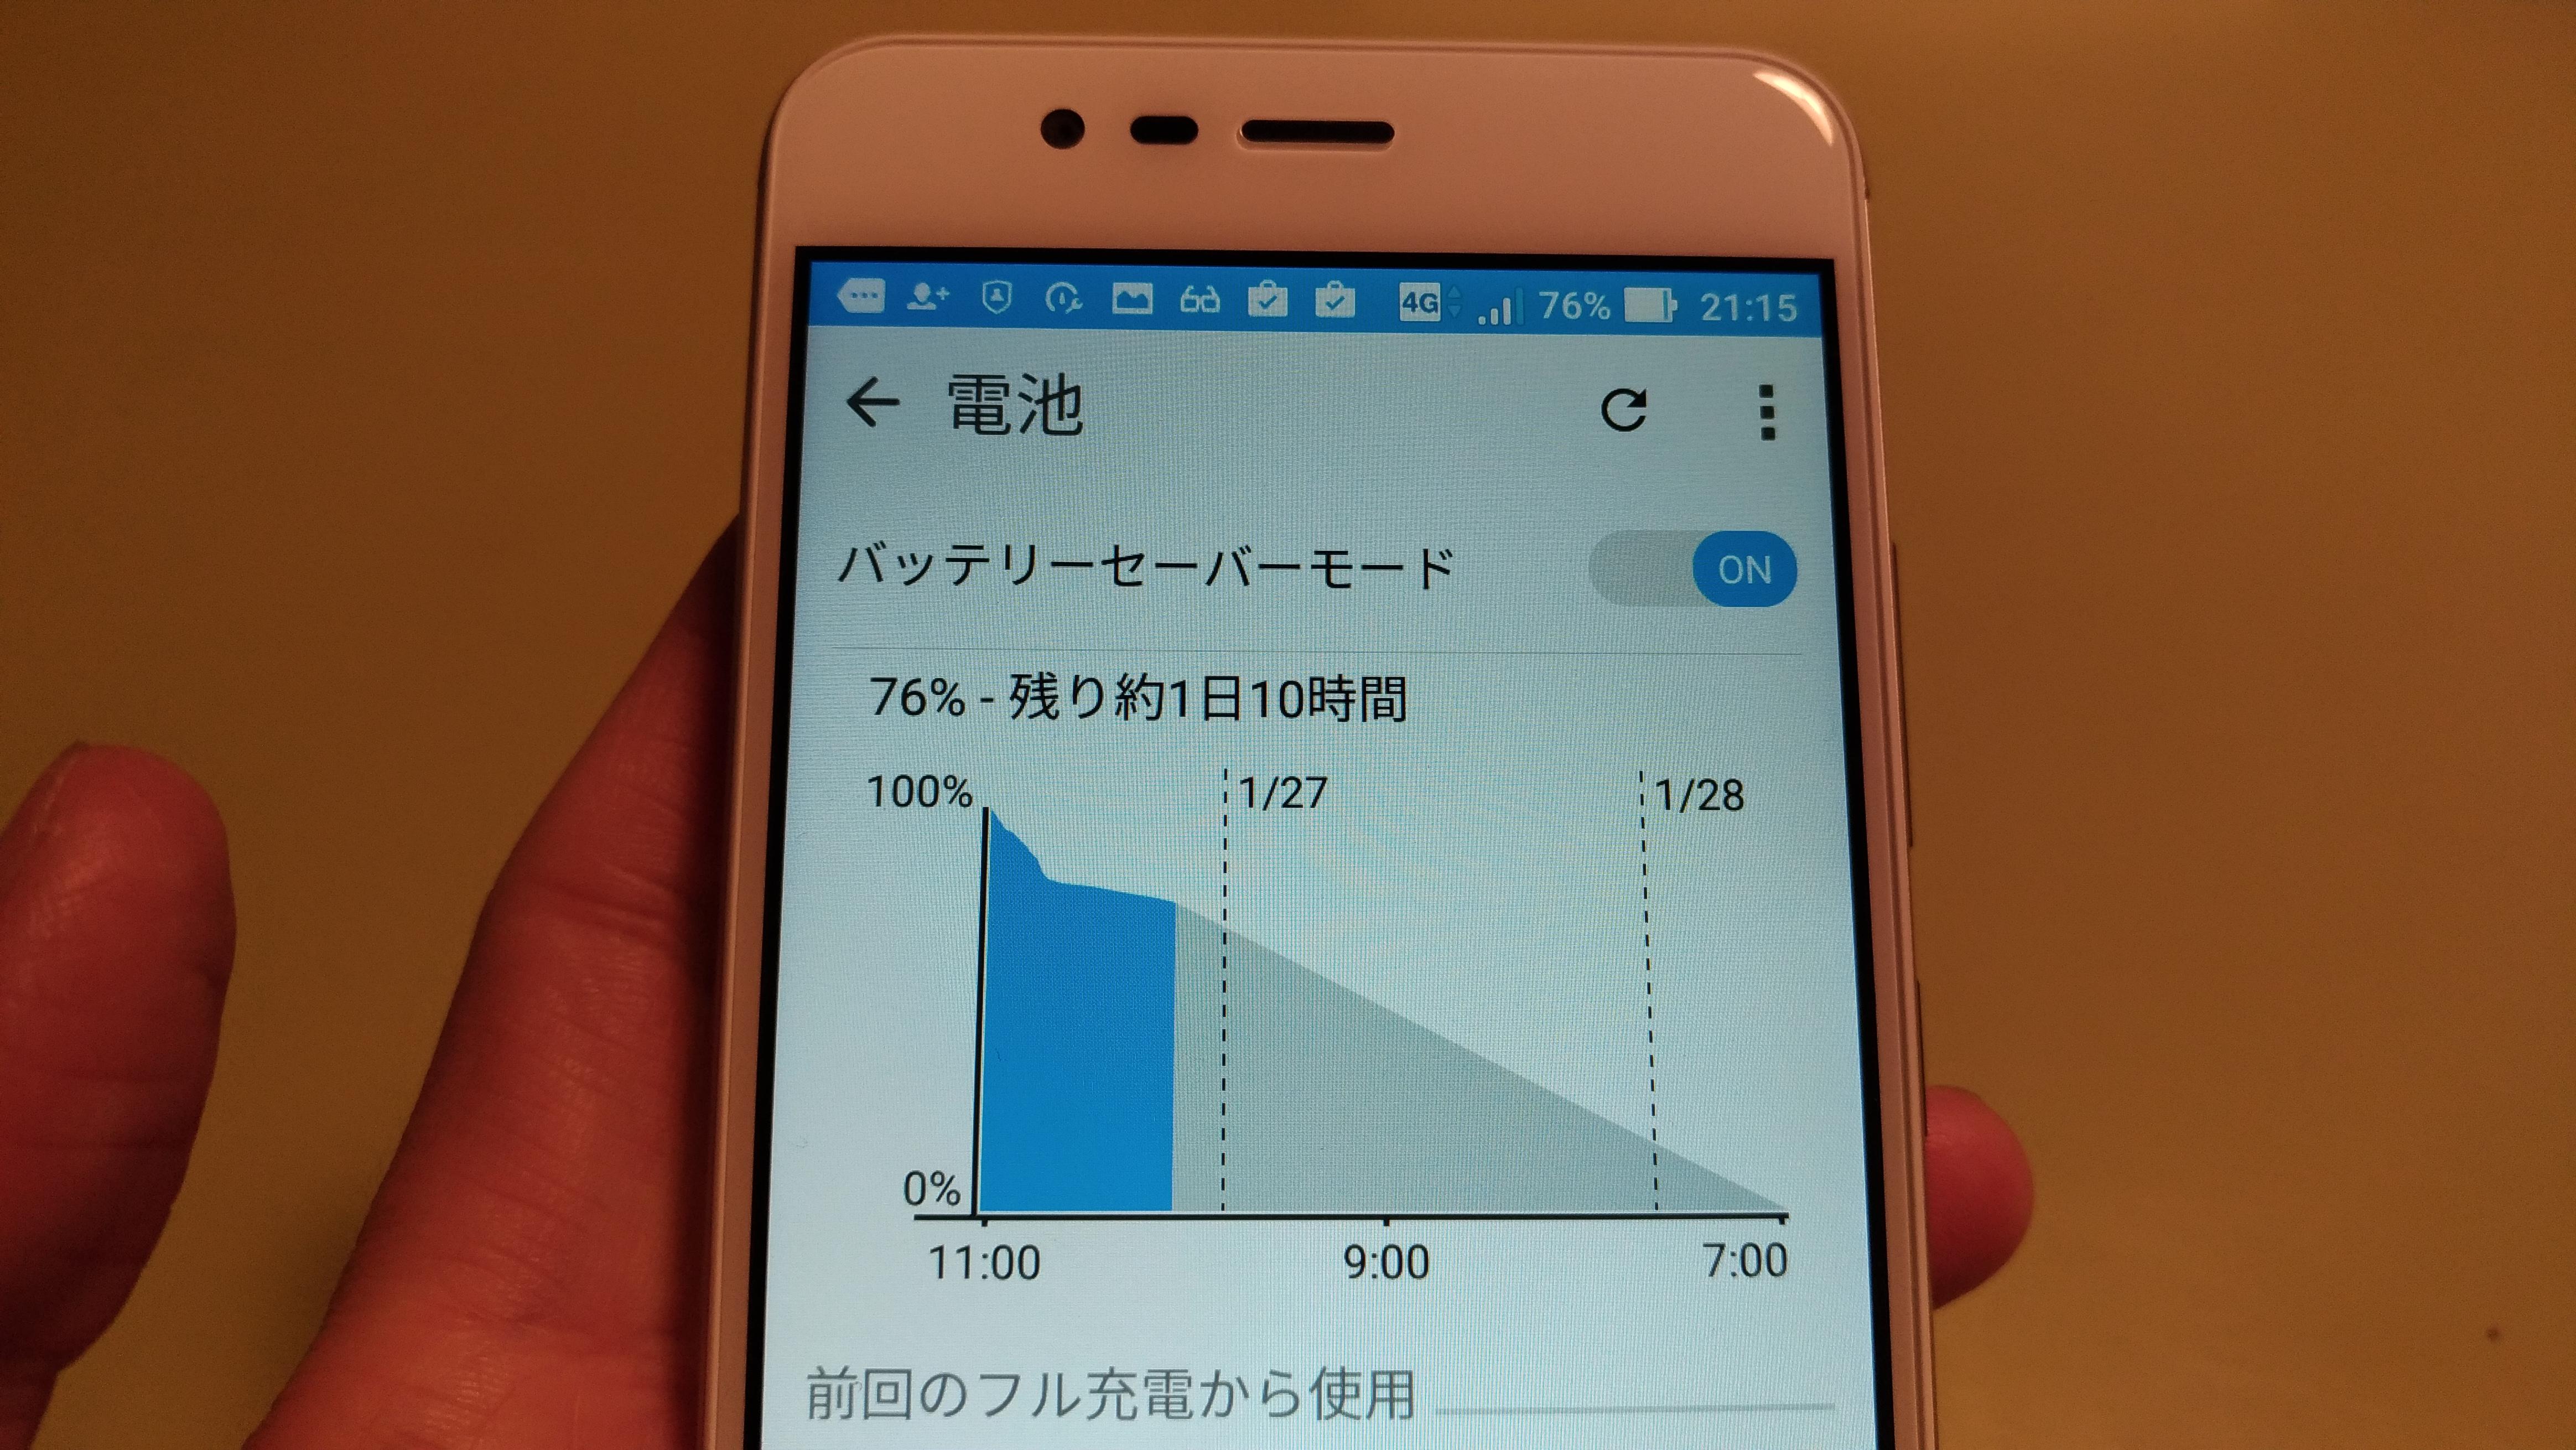 Zenfone 3 Maxのバッテリー稼働時間